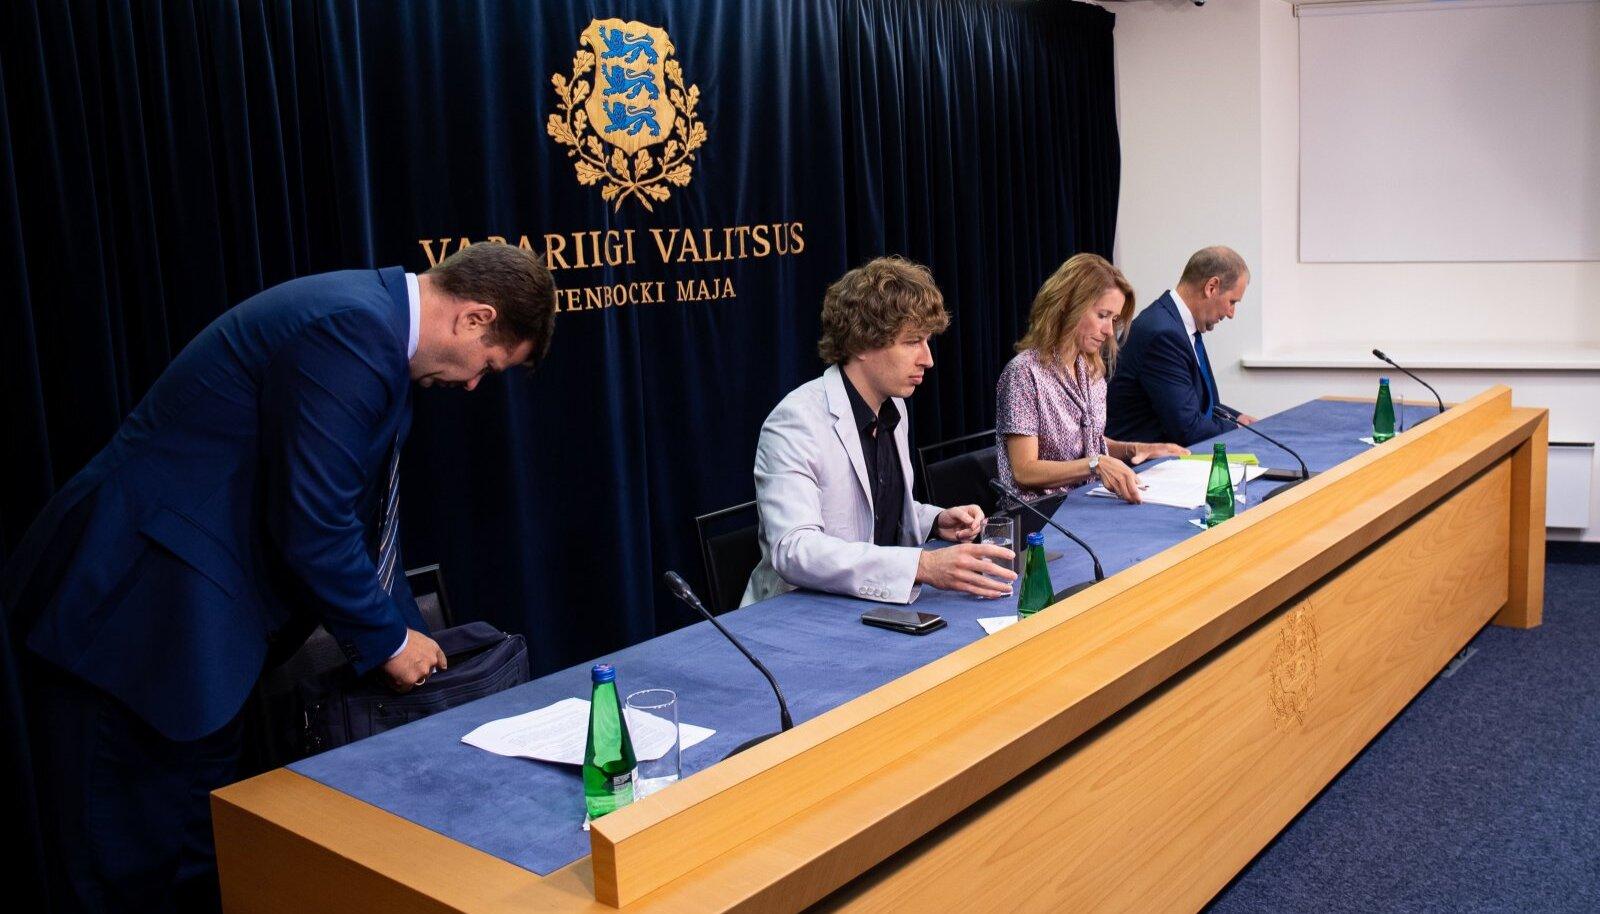 Valituse pressikonverents Stenbocki majas 08.07.2021